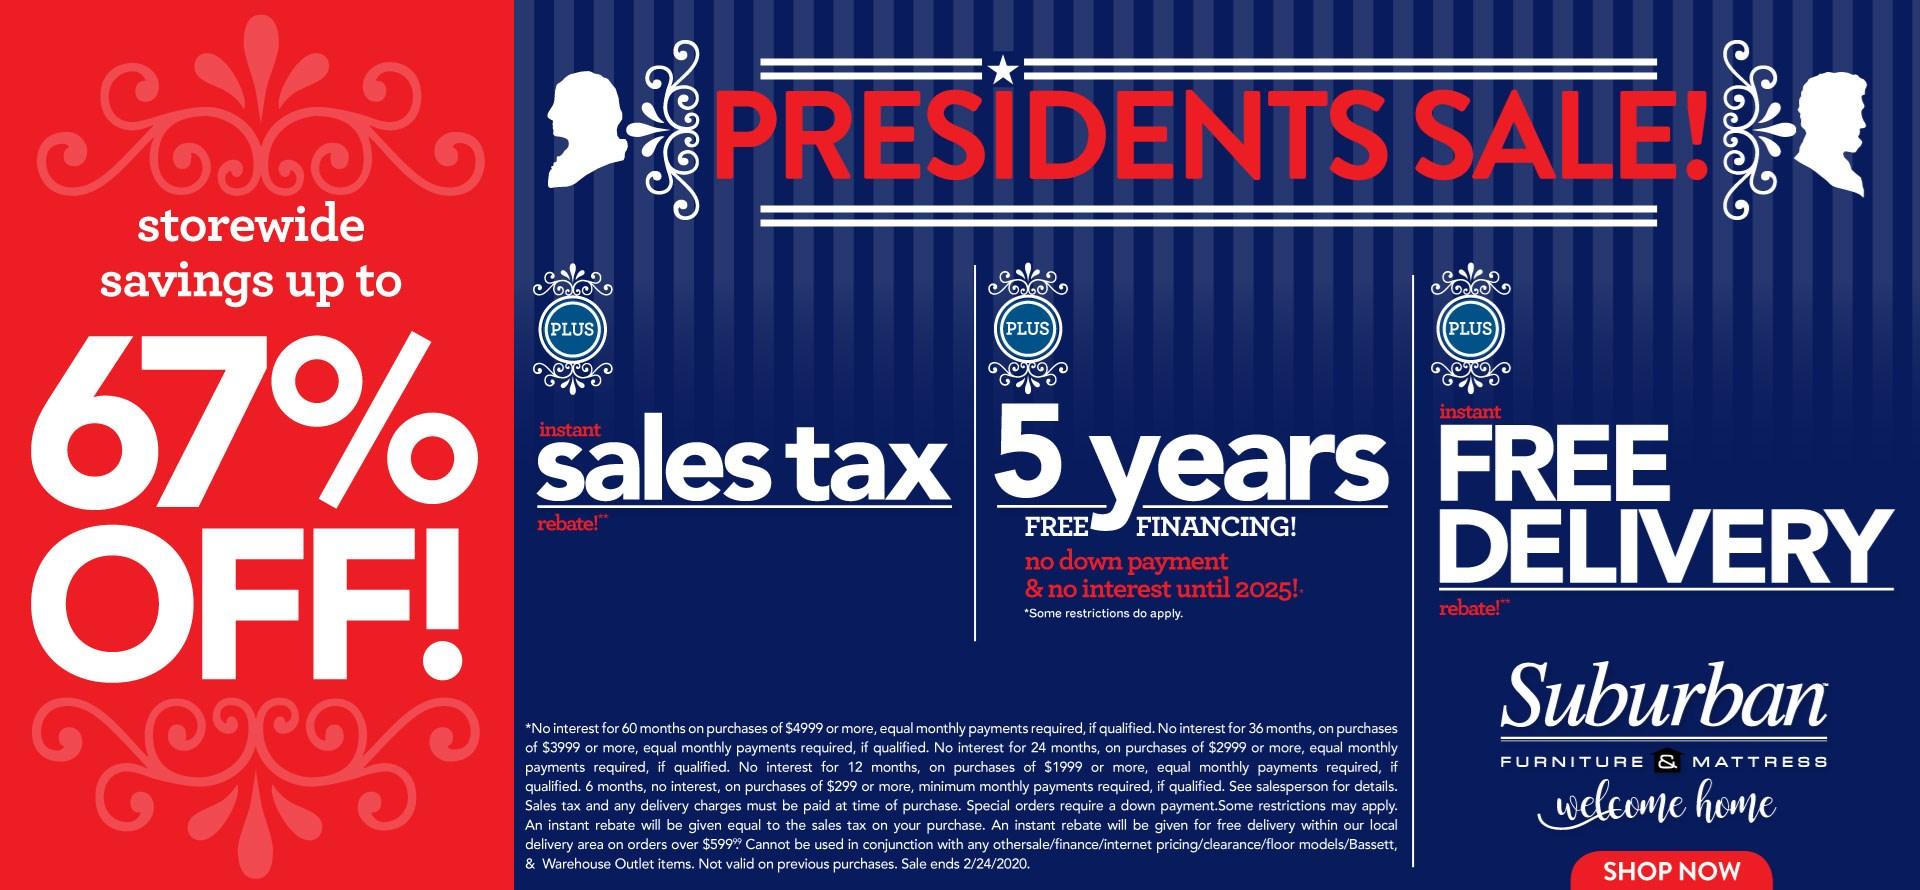 Presidents Sale